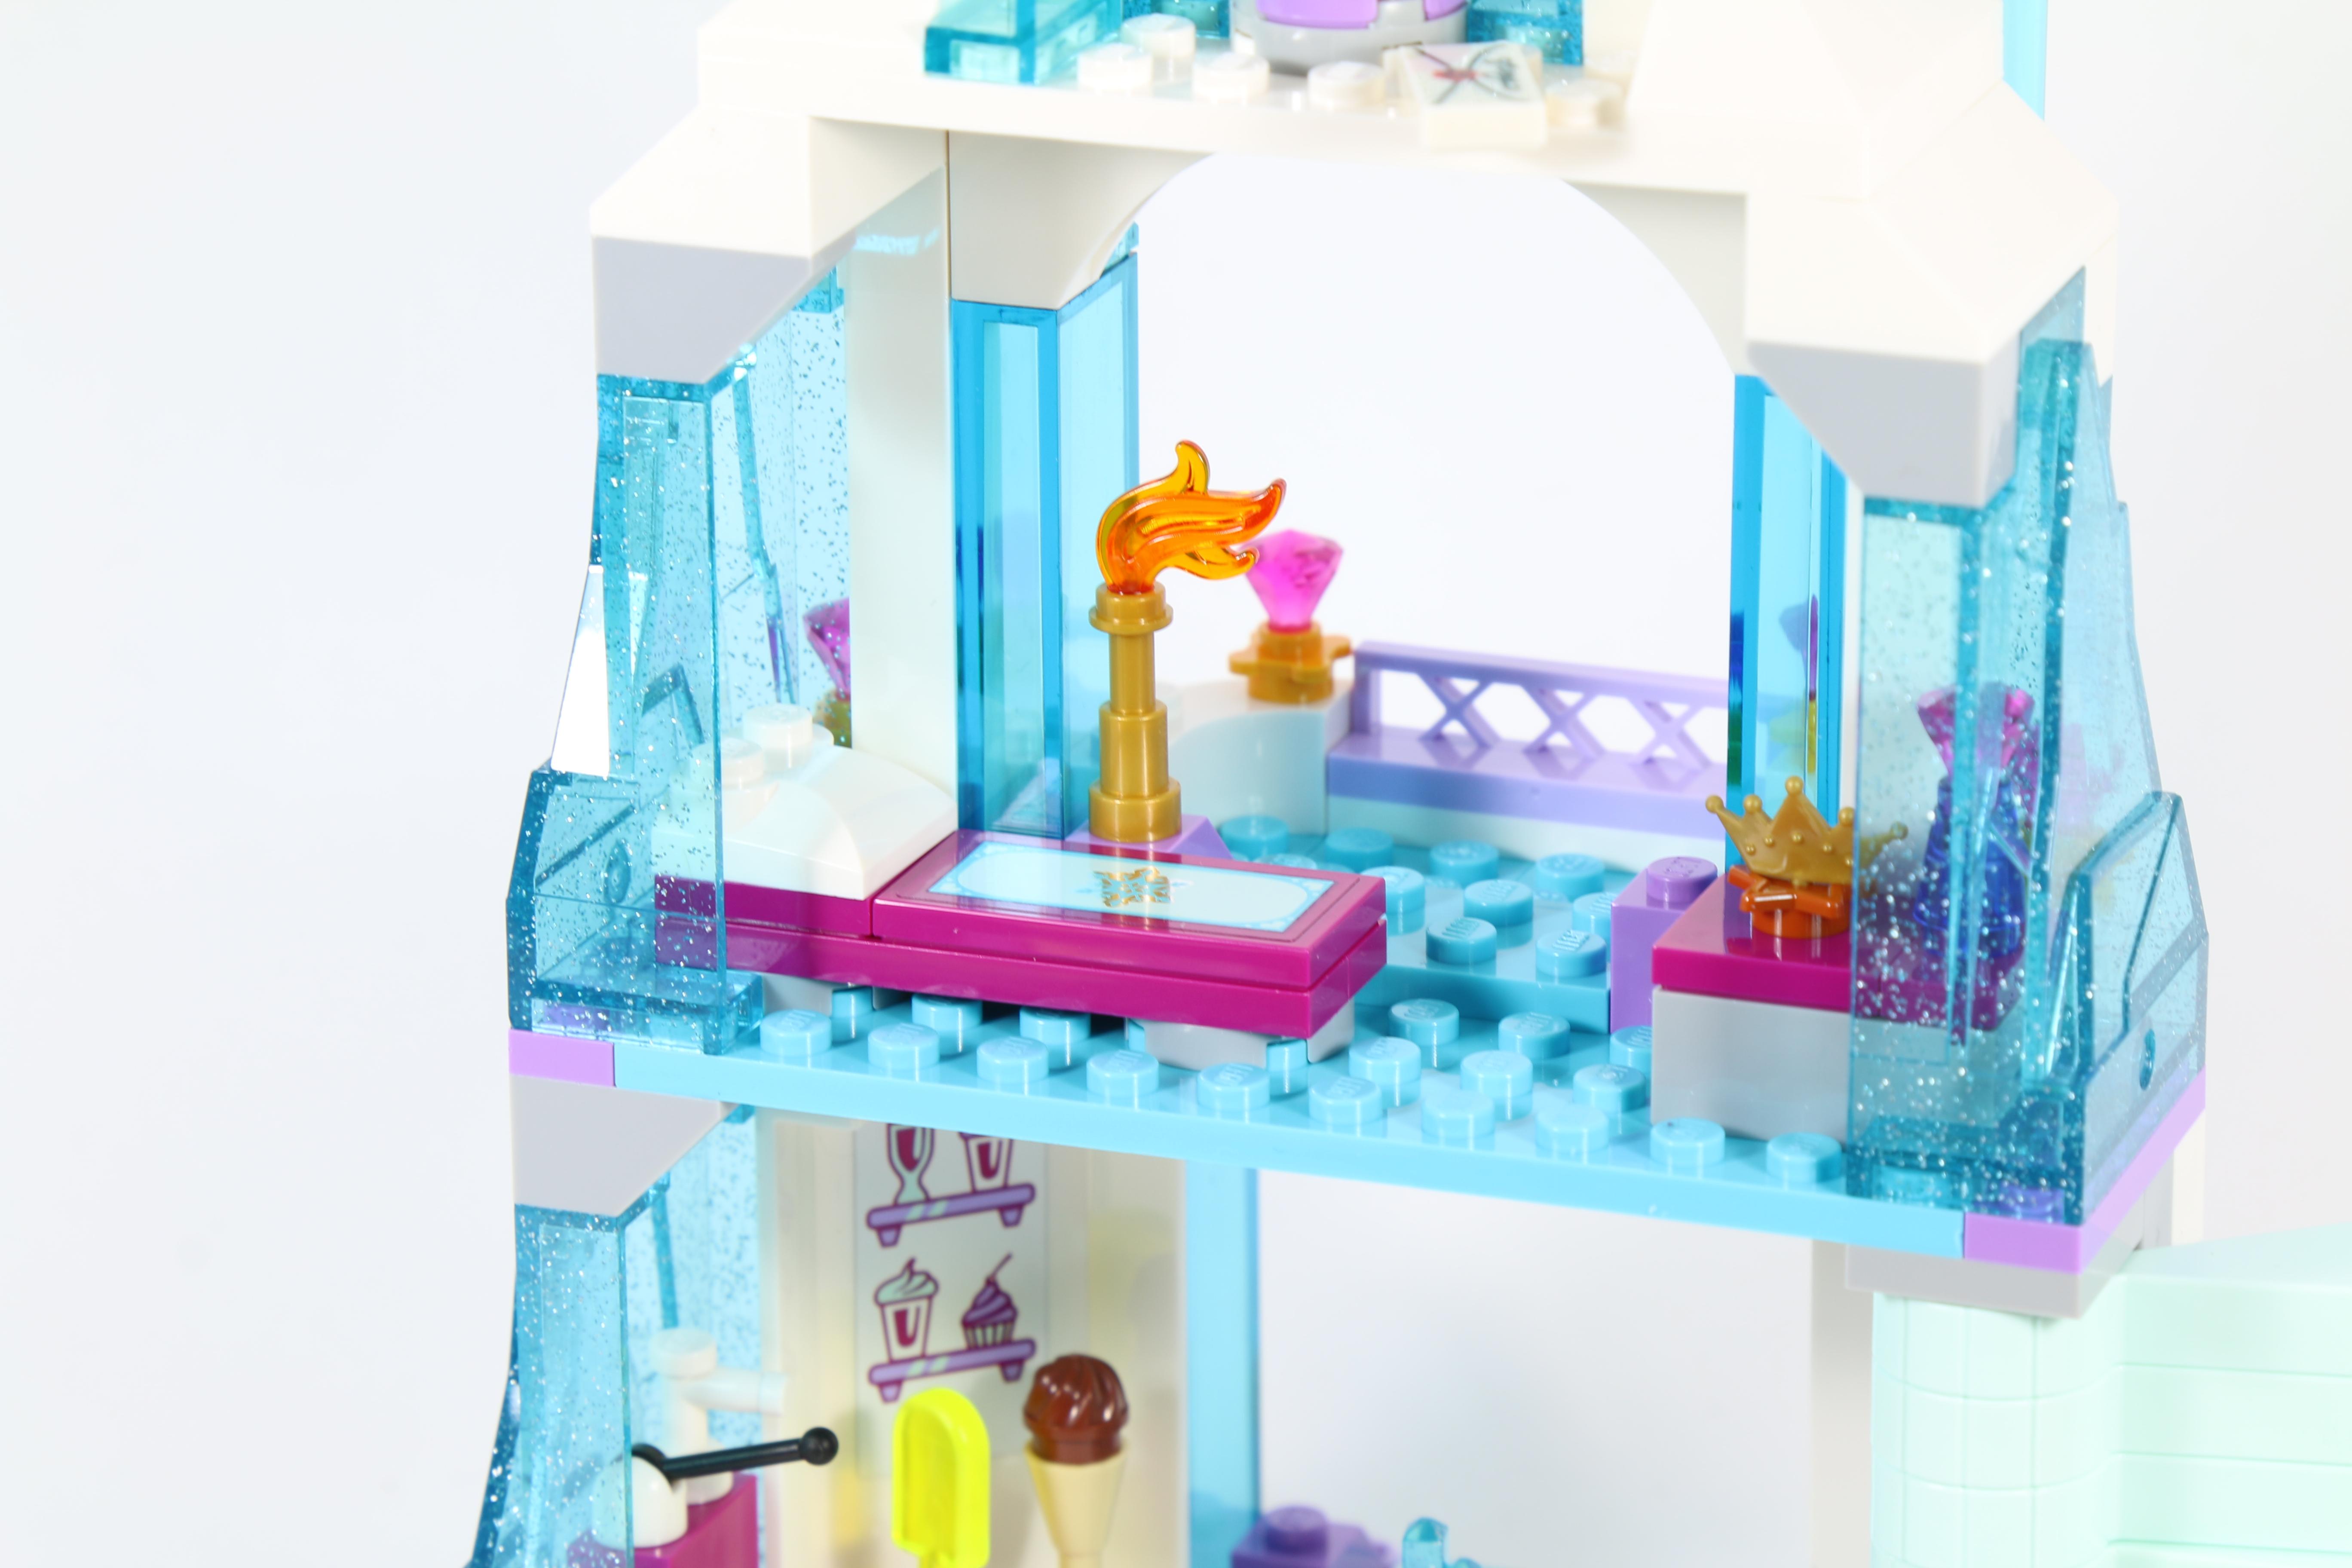 LEGO 41062 Elsa's Sparkling Ice Castle - Elsa's Bedroom